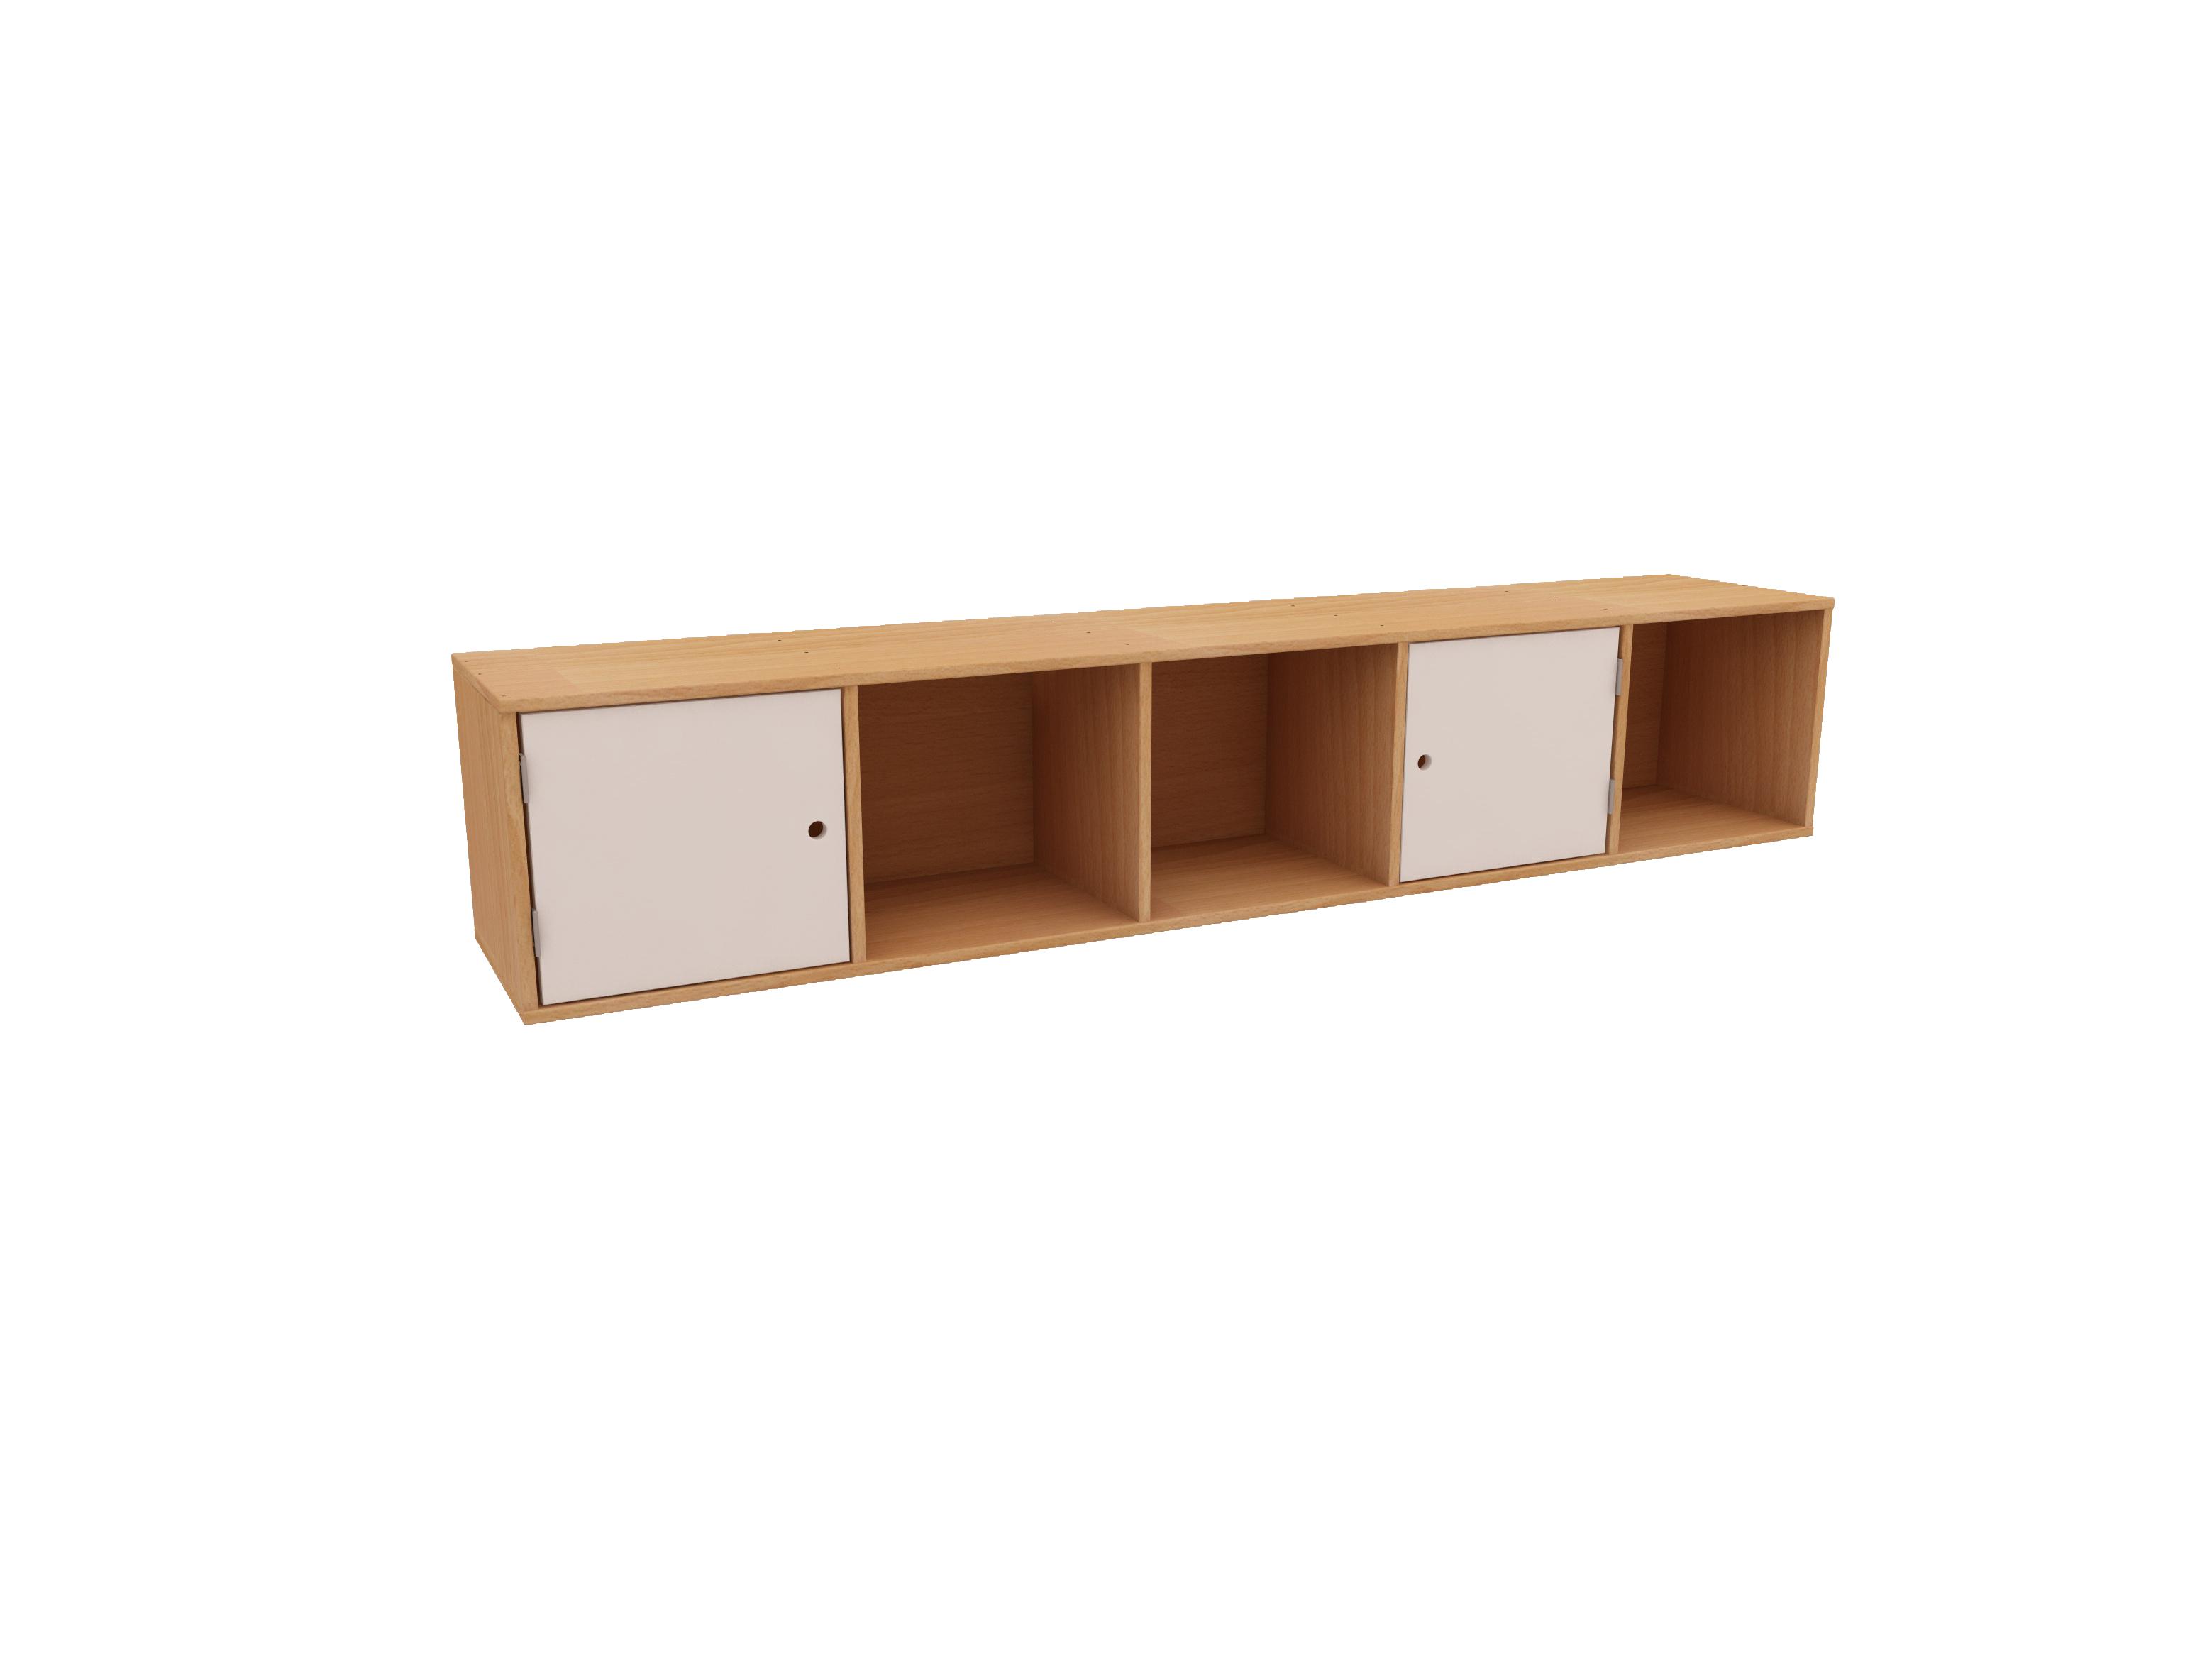 horizontal cubby